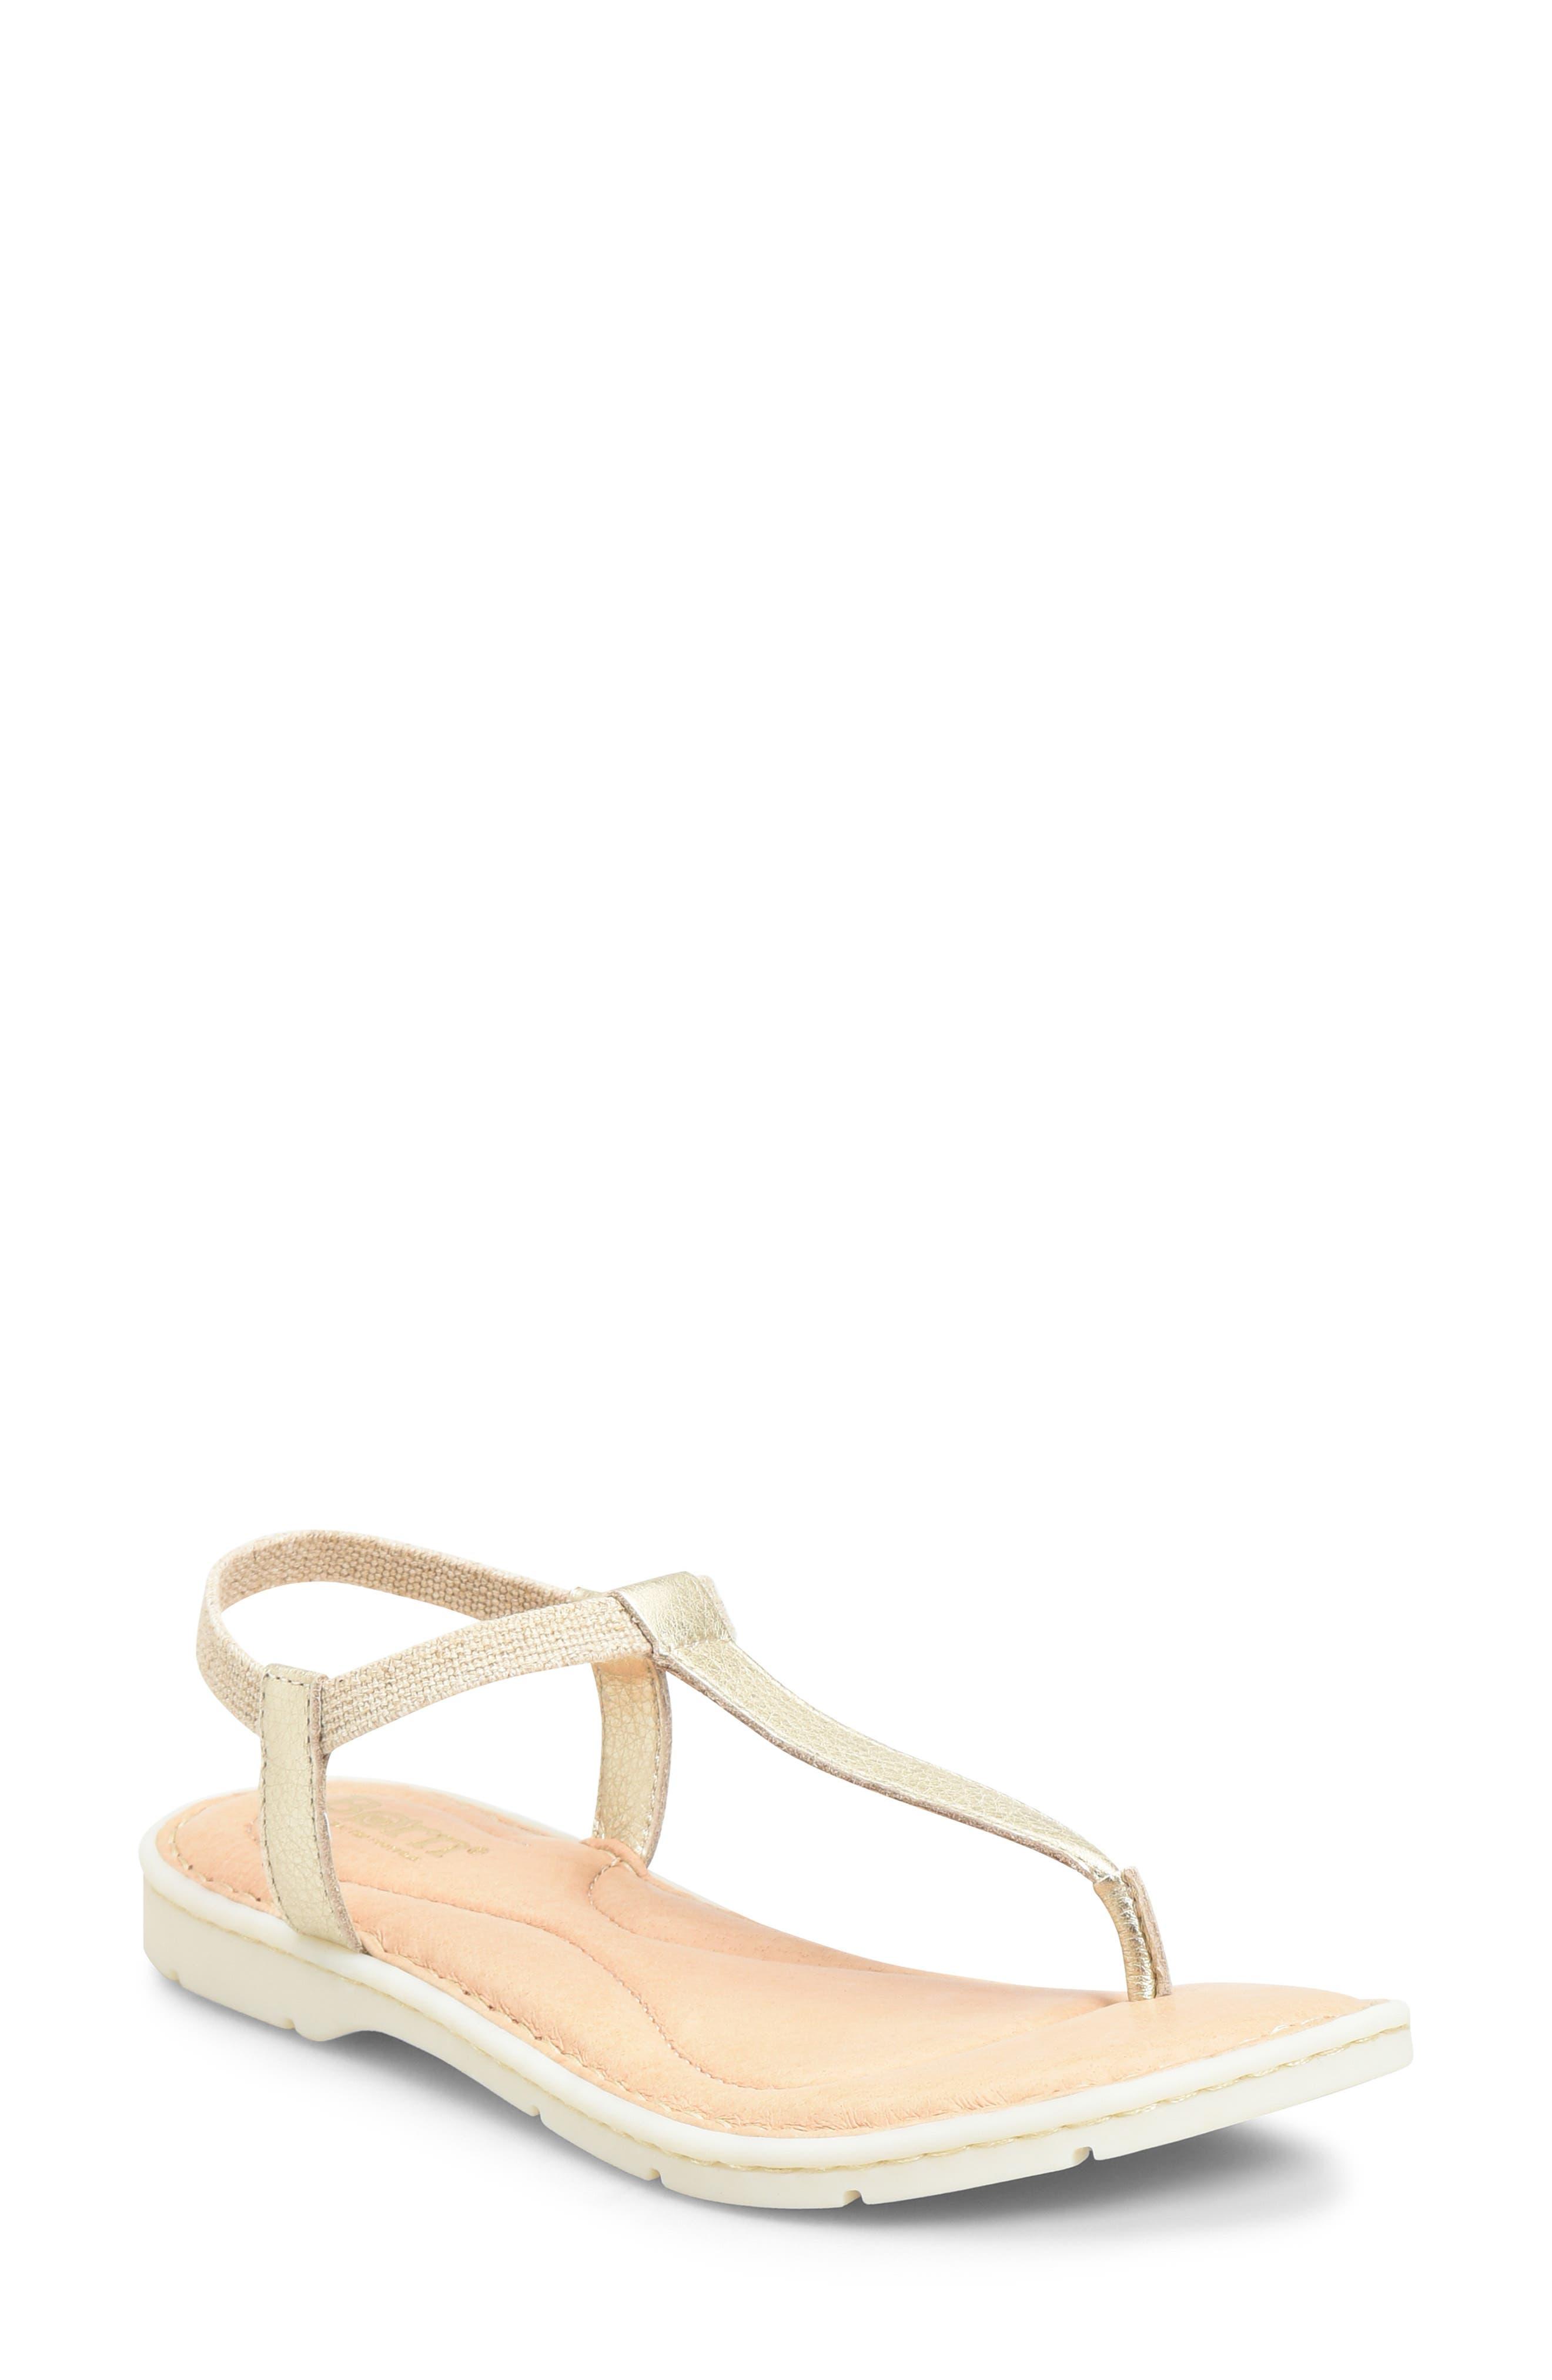 B?rn Trinity T-Strap Sandal, Metallic